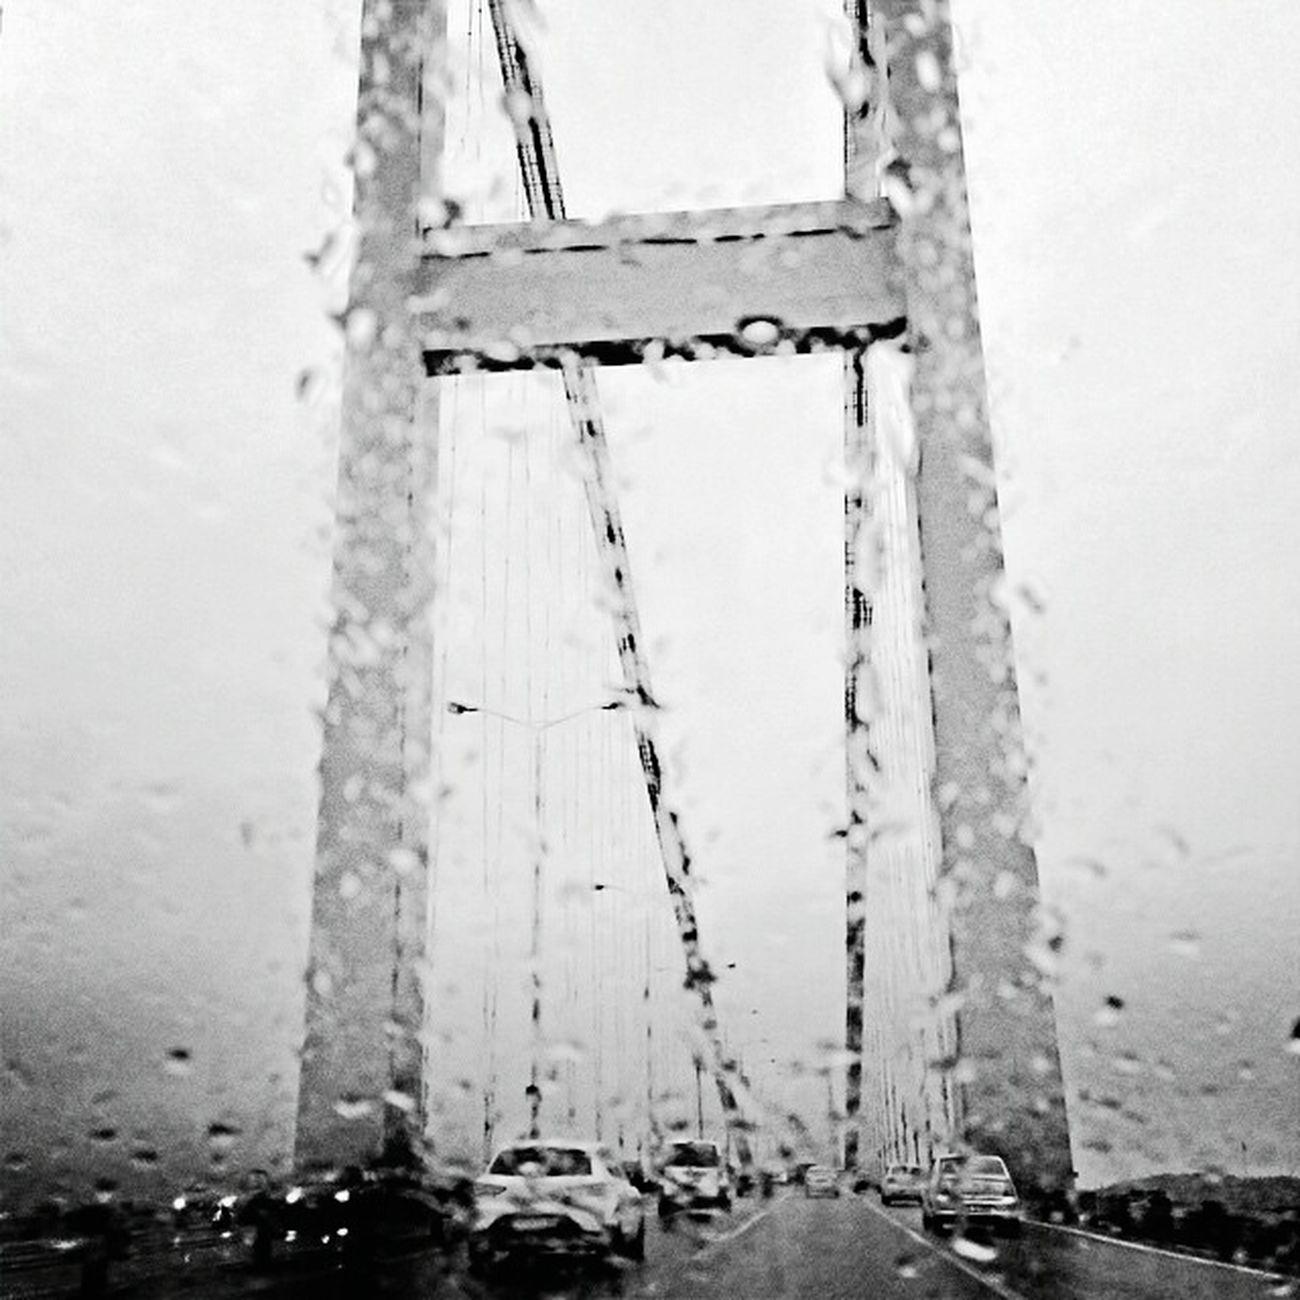 Black & White Streetphotography_bw Blackandwhite Black And White Streetphotography Eyemstreetphoto Eyembestshots Blackandwhitephotography Streetphoto_bw Bosphorus Bridge